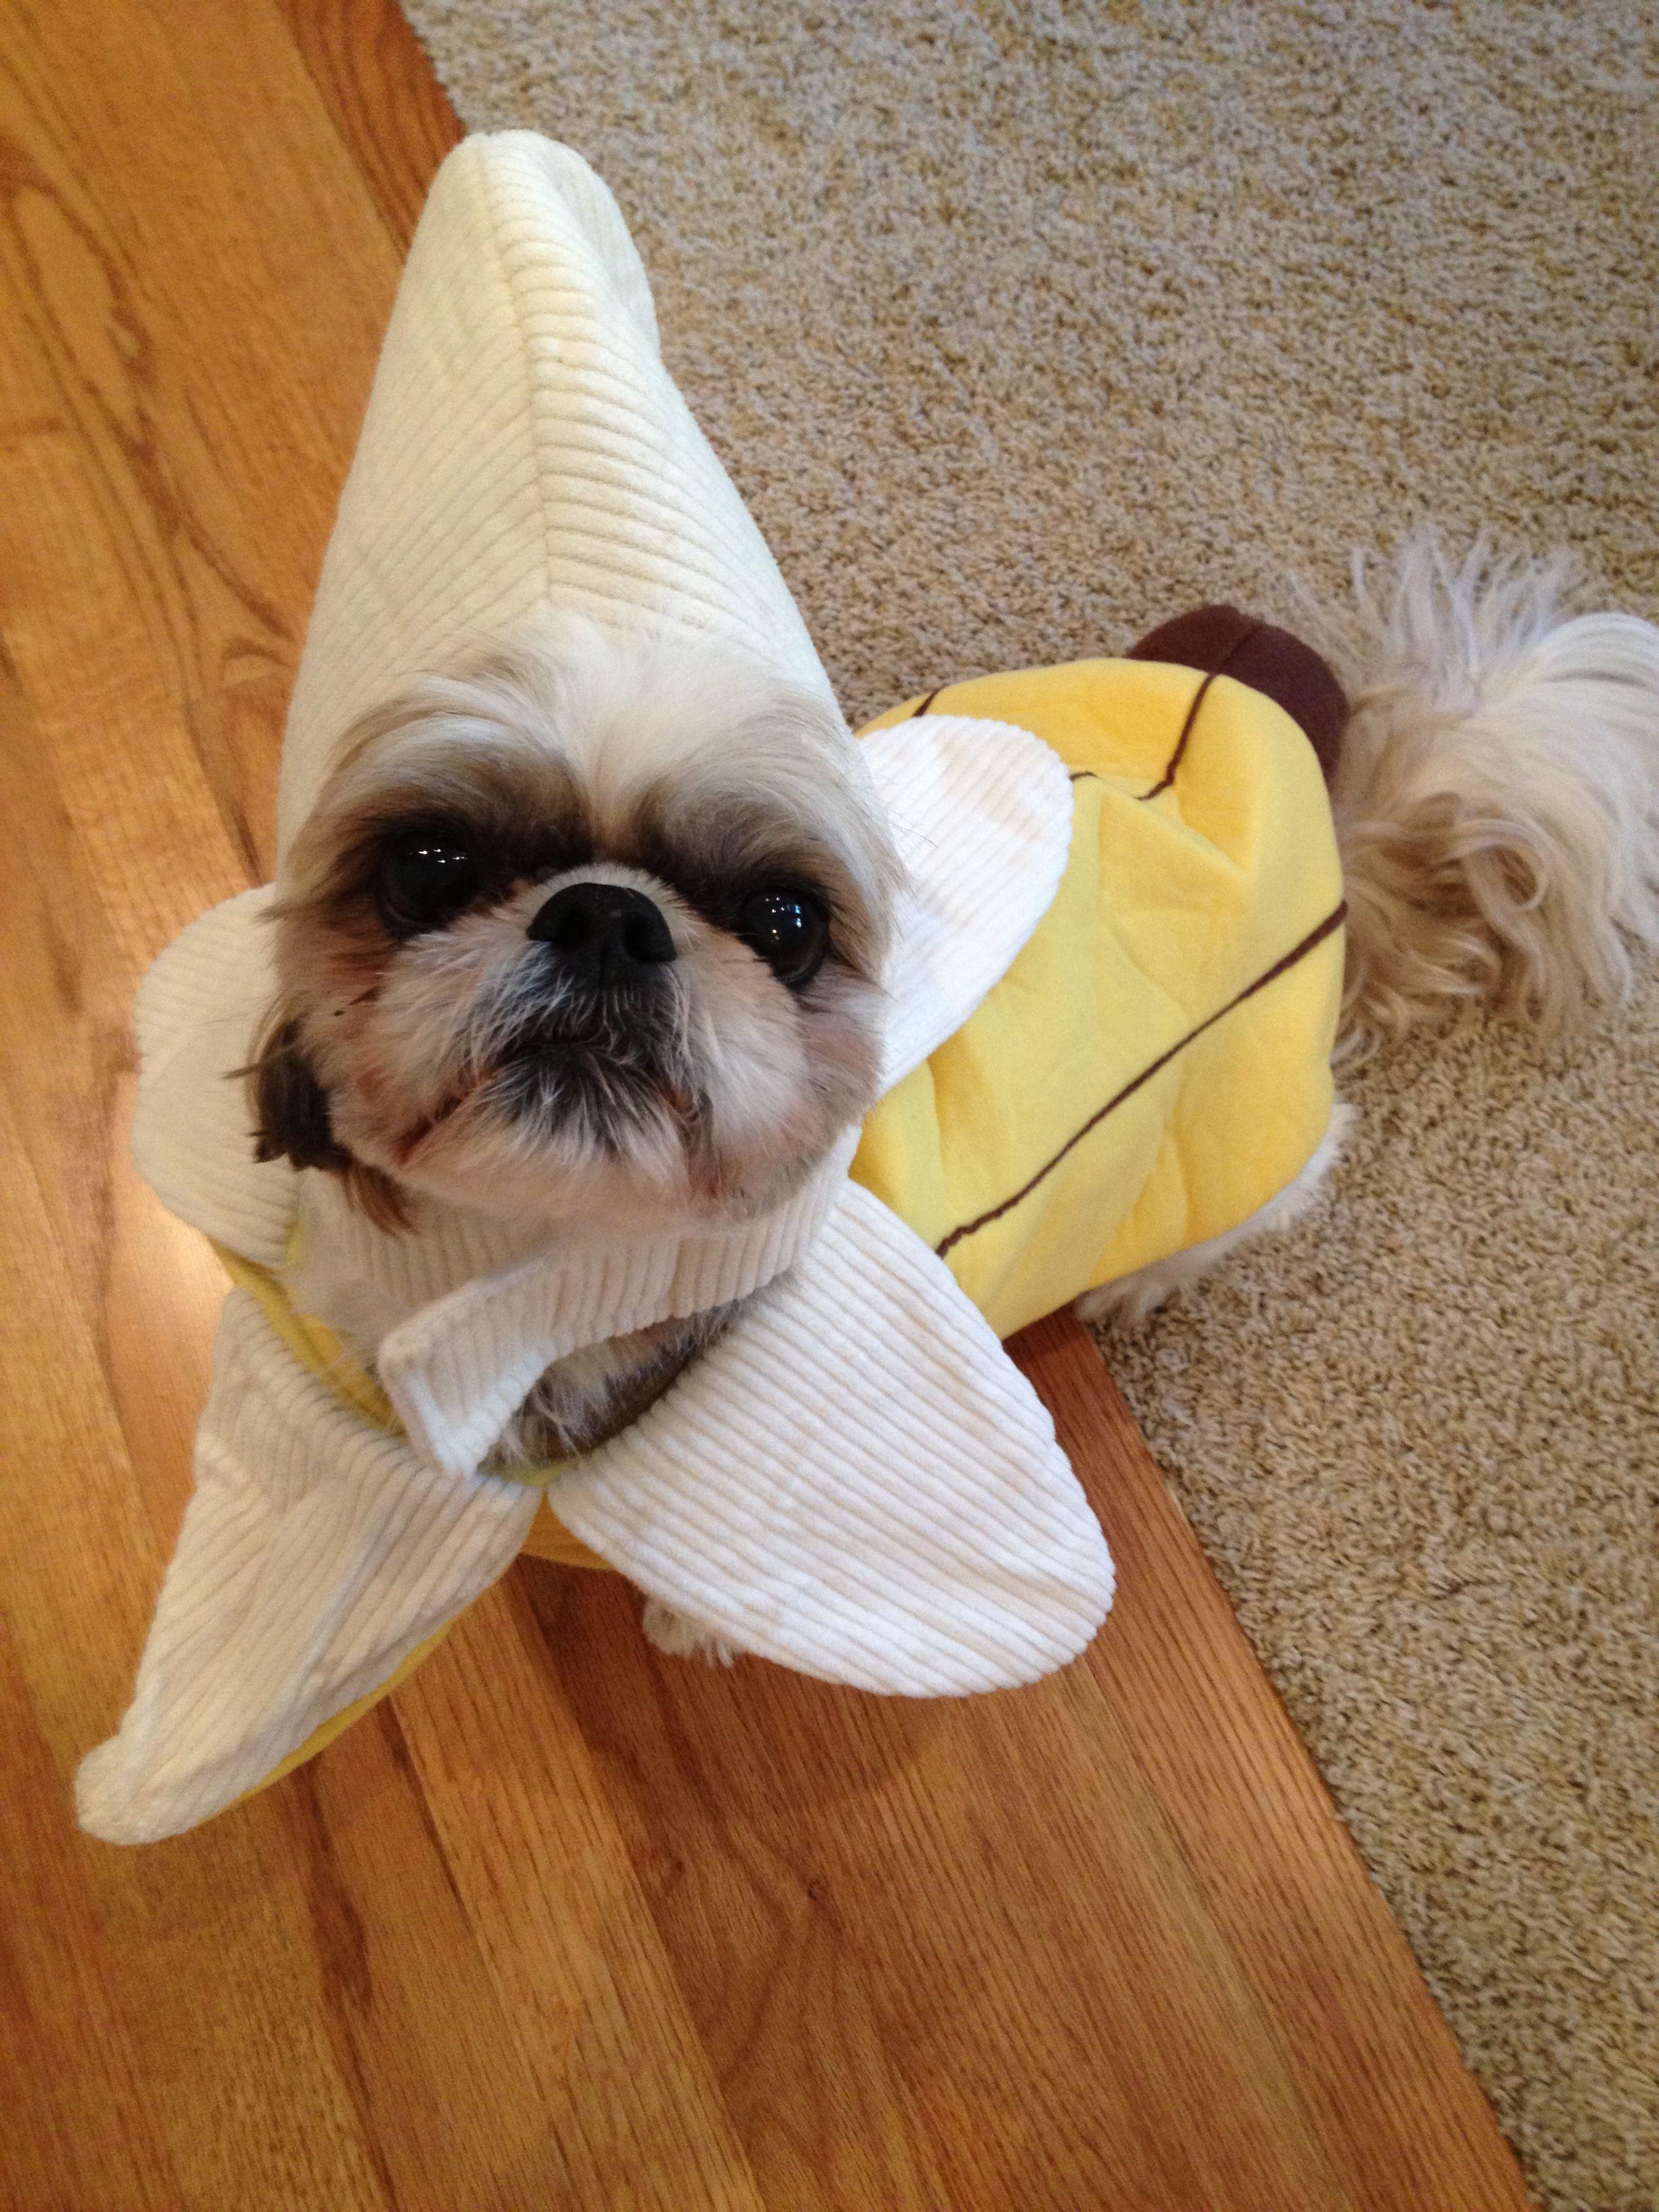 Shih tzu in a banana costume ) Dog halloween costumes